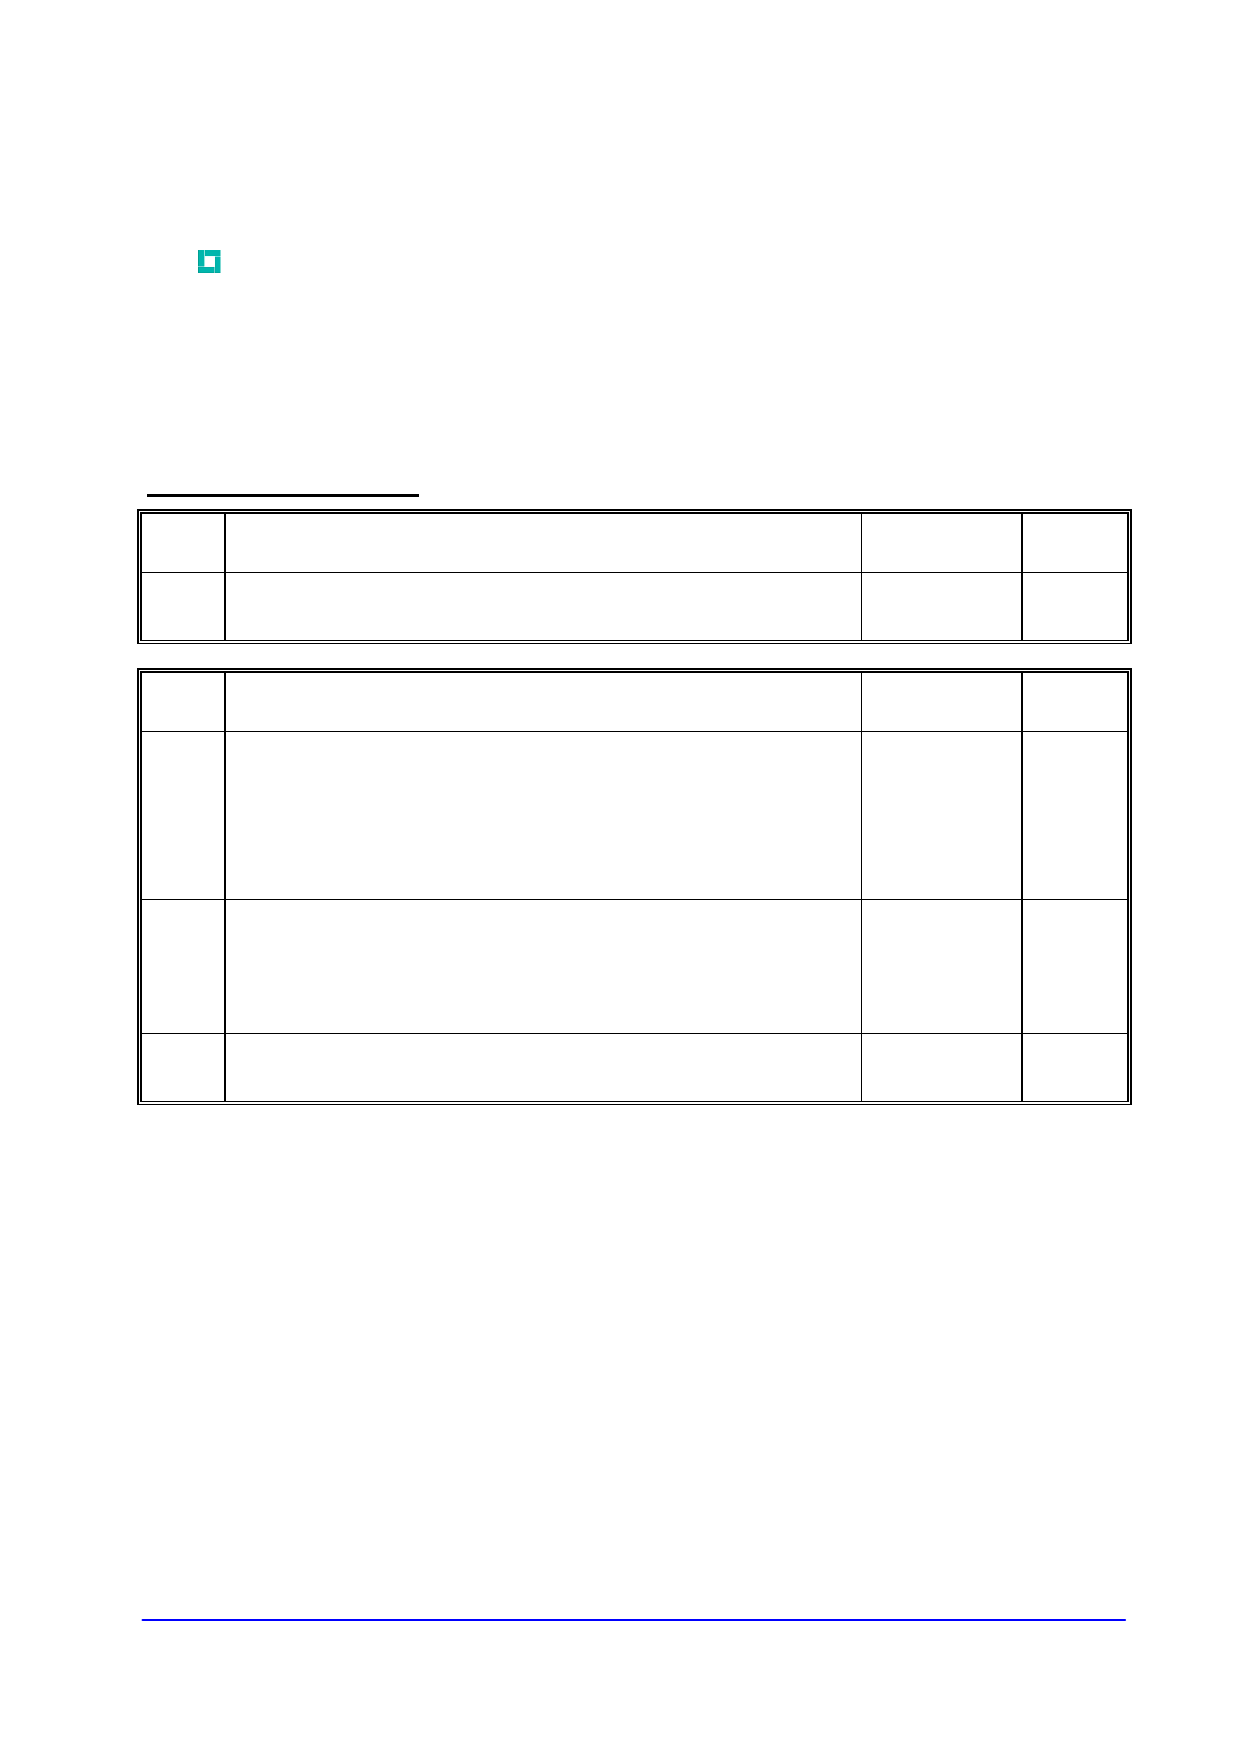 W4096ZD360 Datenblatt PDF